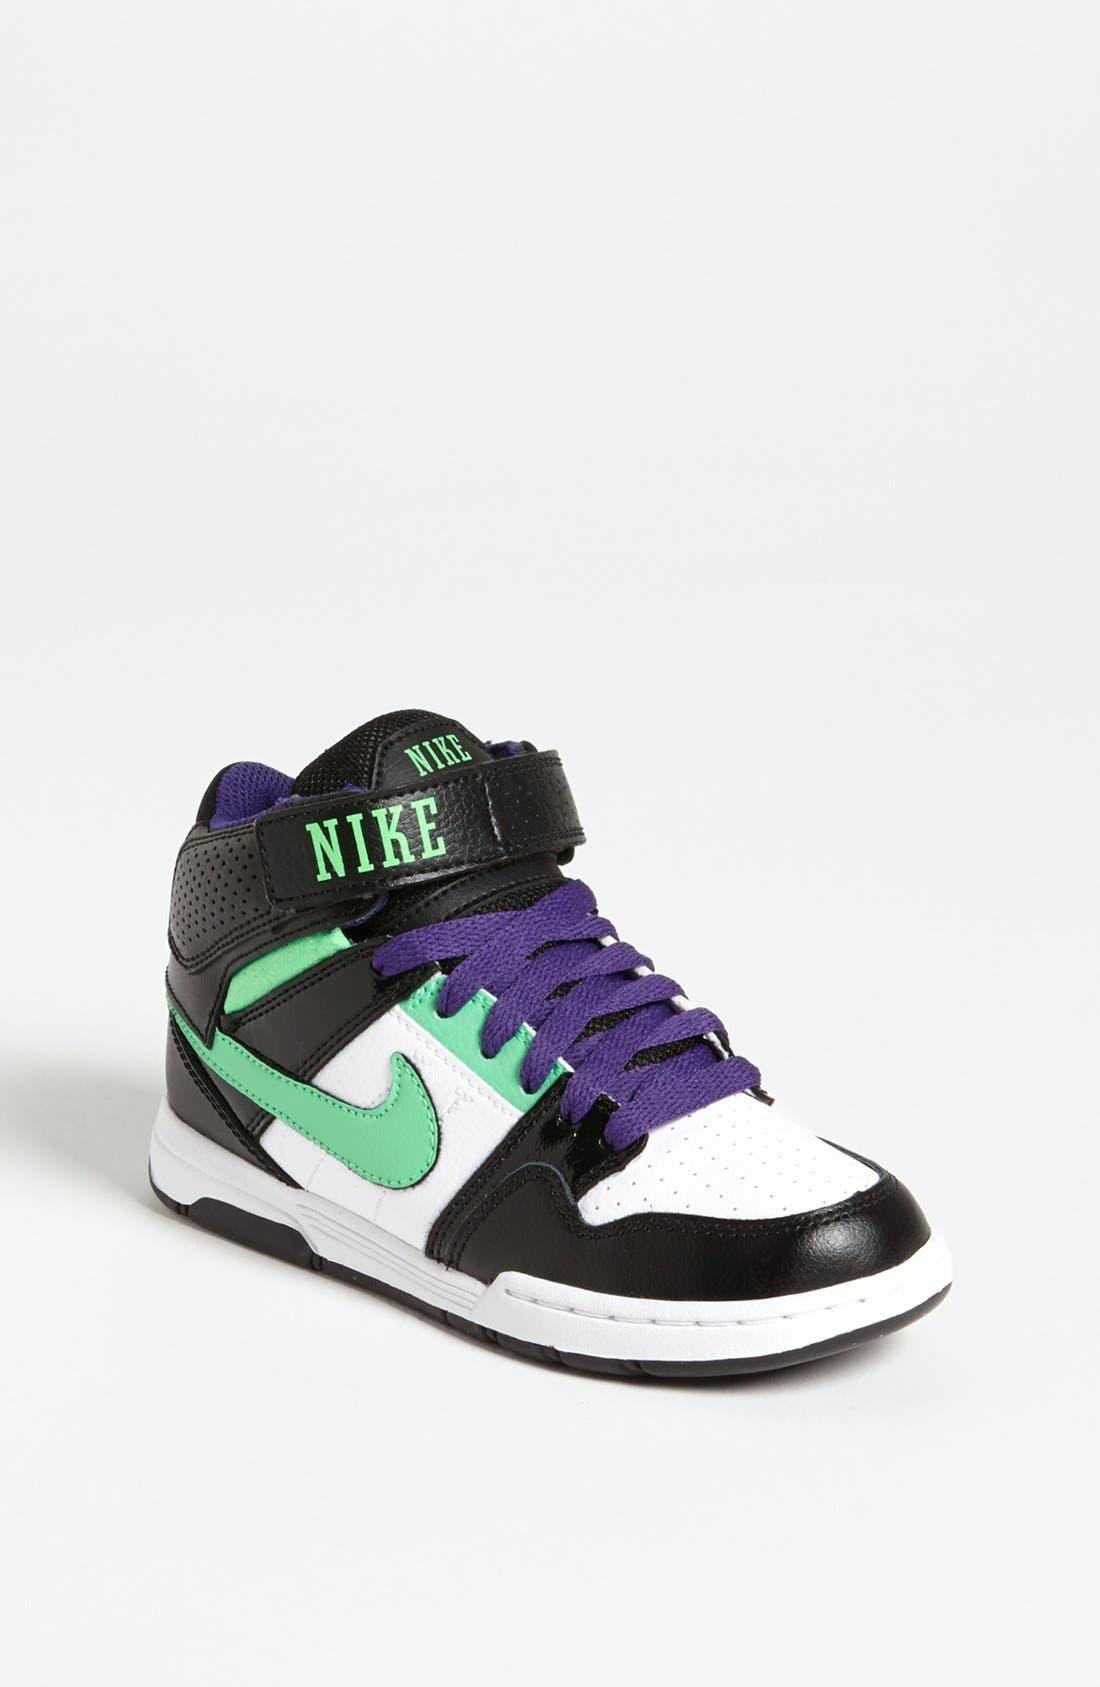 Main Image - Nike 6.0 'Mogan Mid' Sneaker (Toddler, Little Kid & Big Kid)